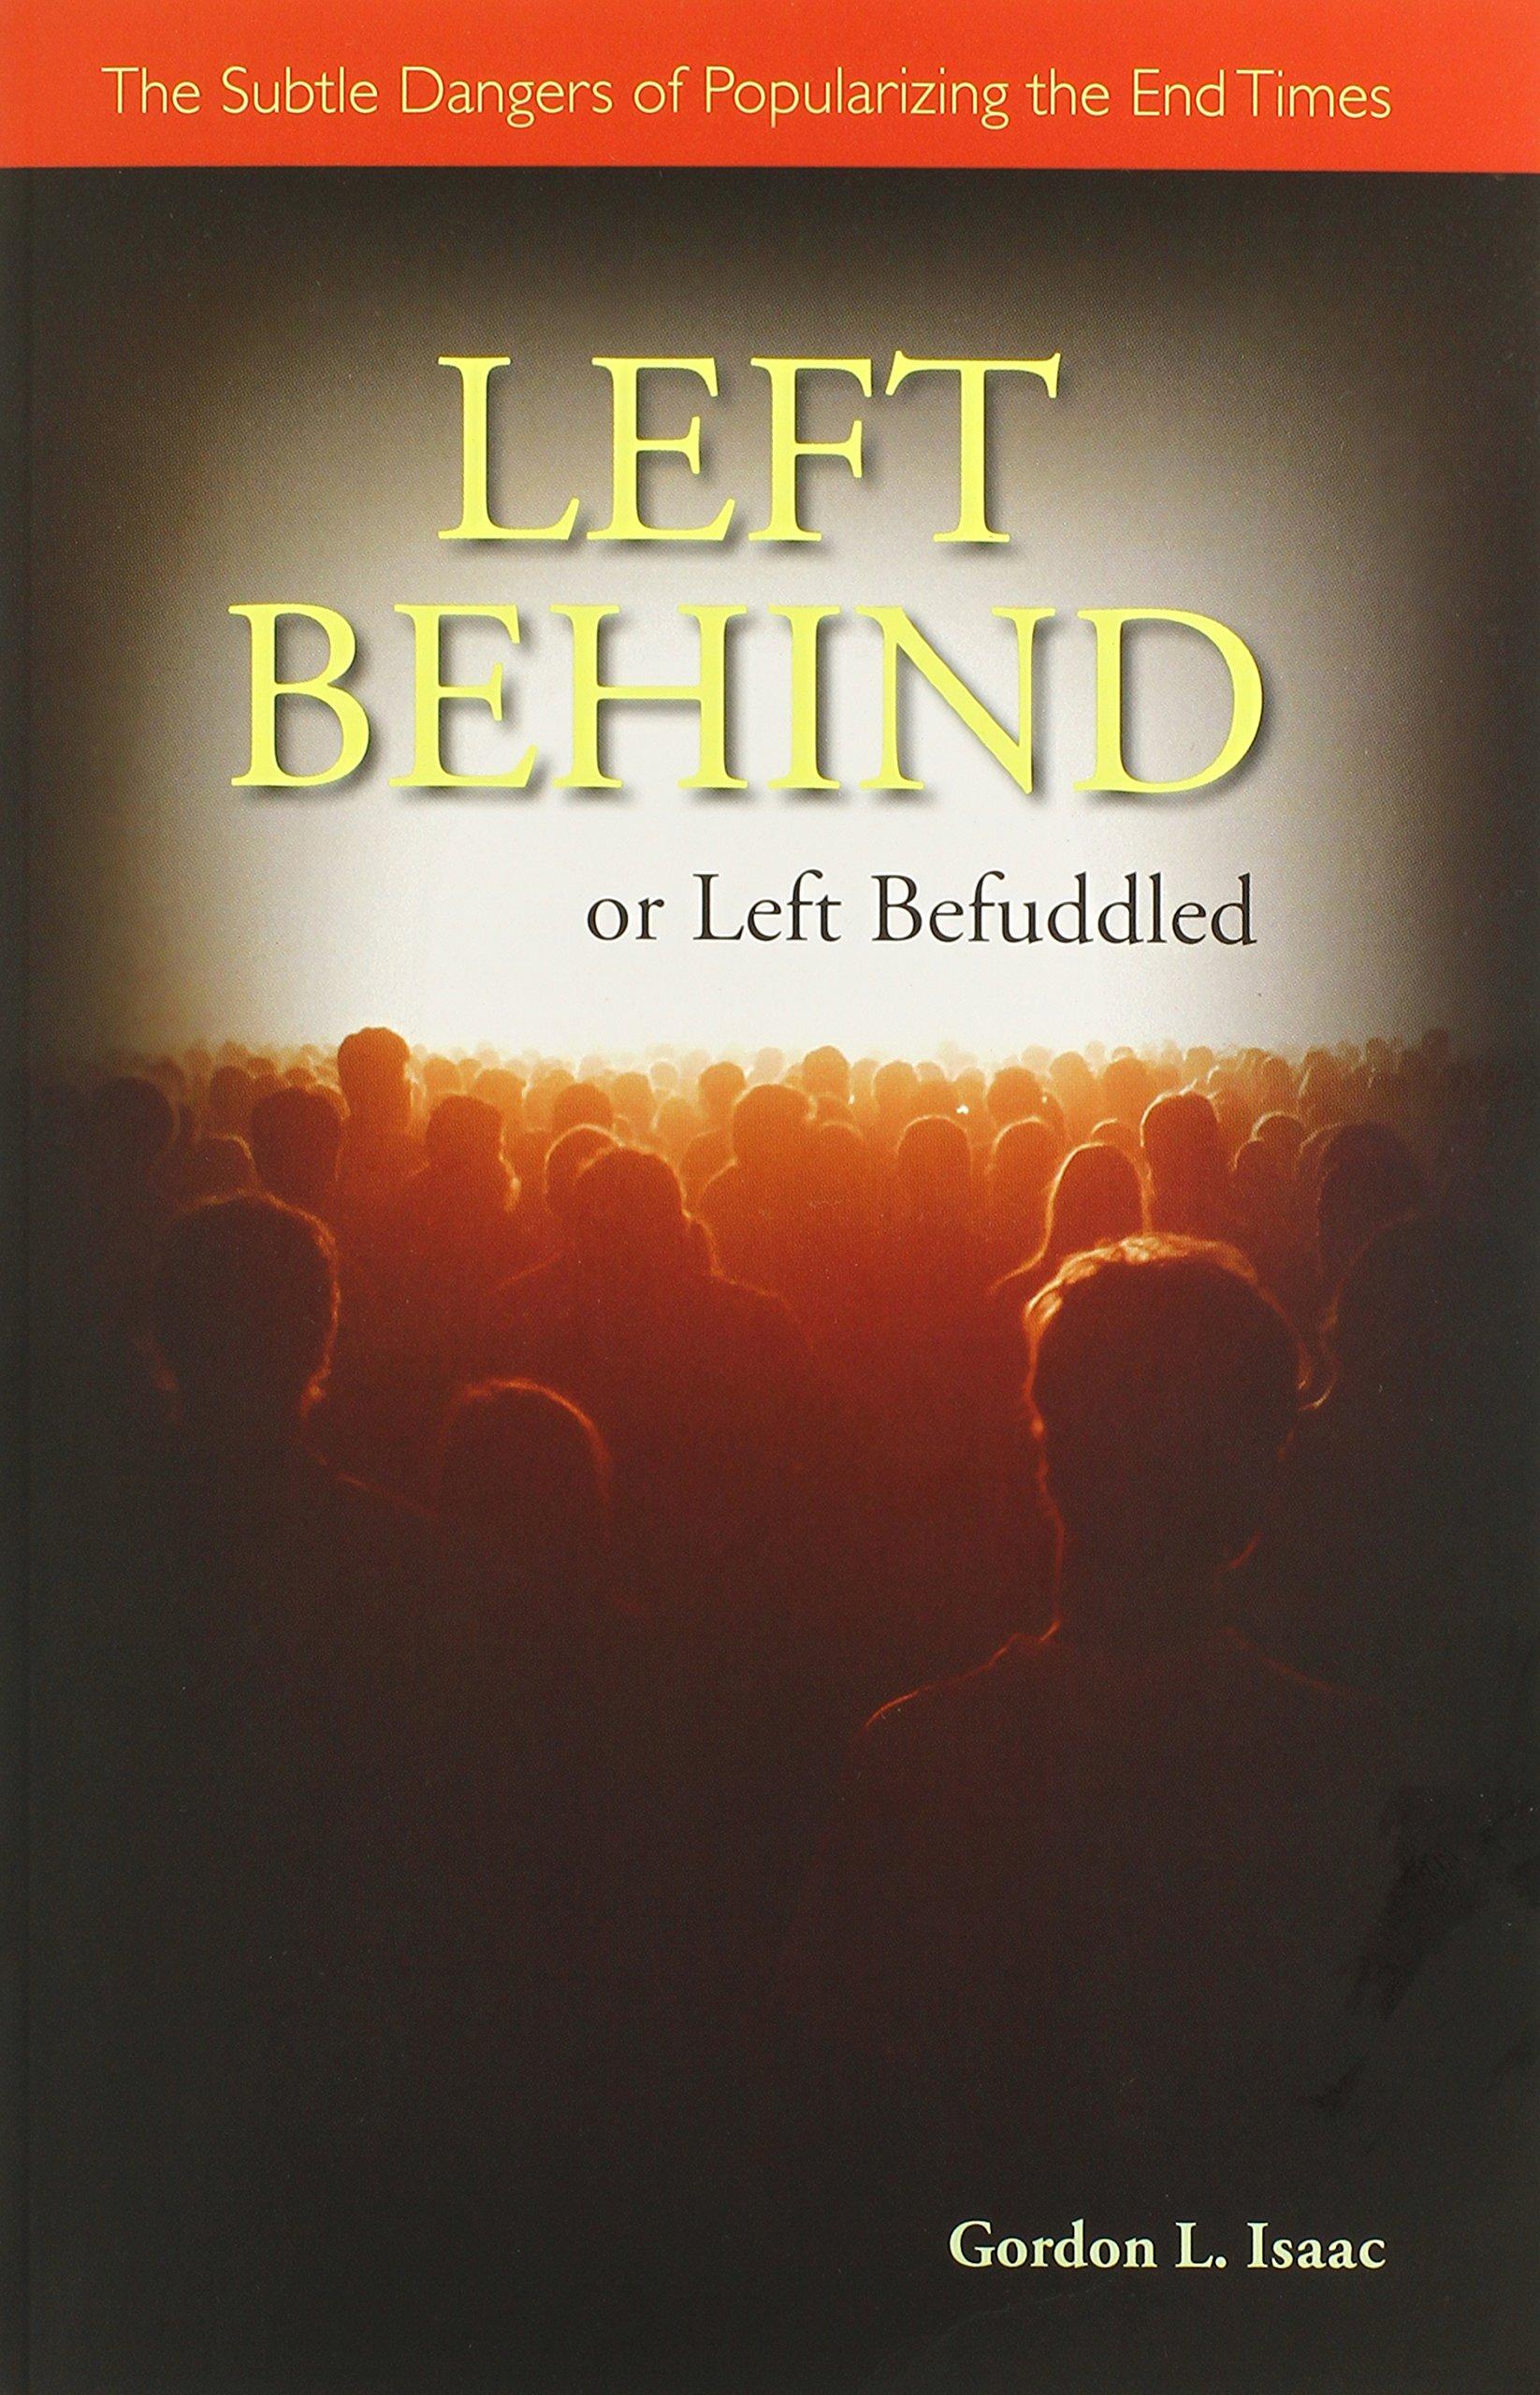 Read Online Left Behind or Left Befuddled: The Subtle Dangers of Popularizing the End Times PDF